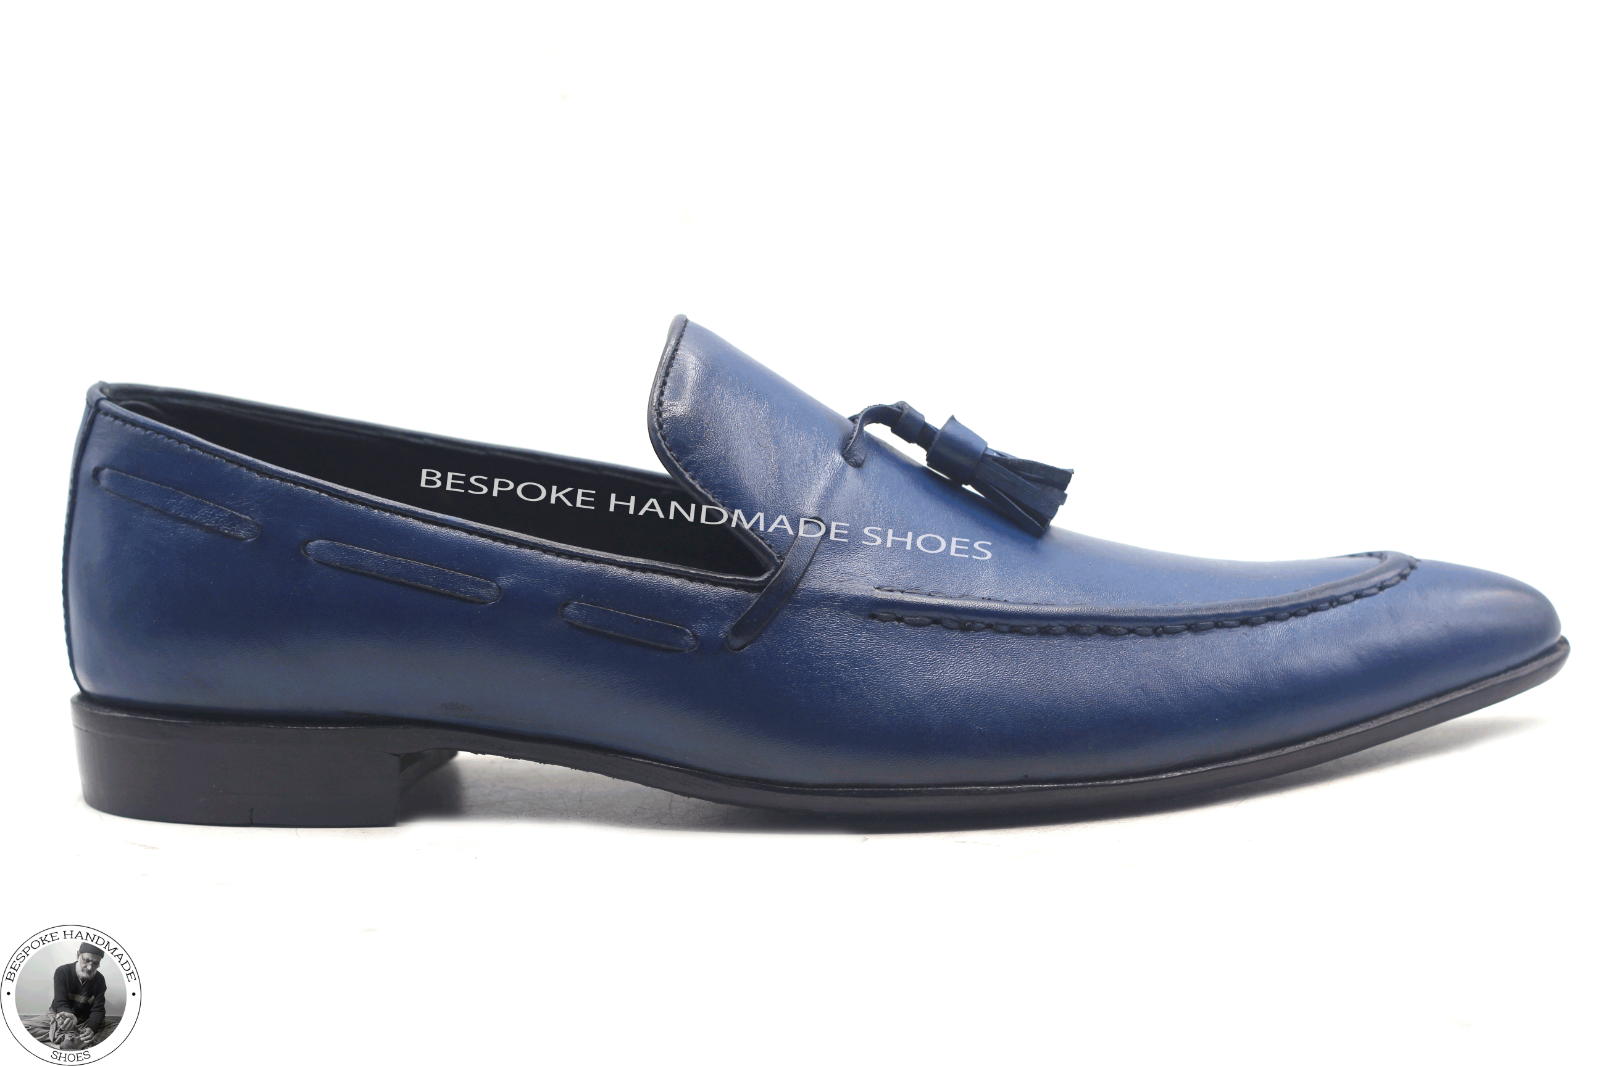 Handgemachte Herren echte blaue Leder Slipper & Slip On Casual Mokassins Schuhe